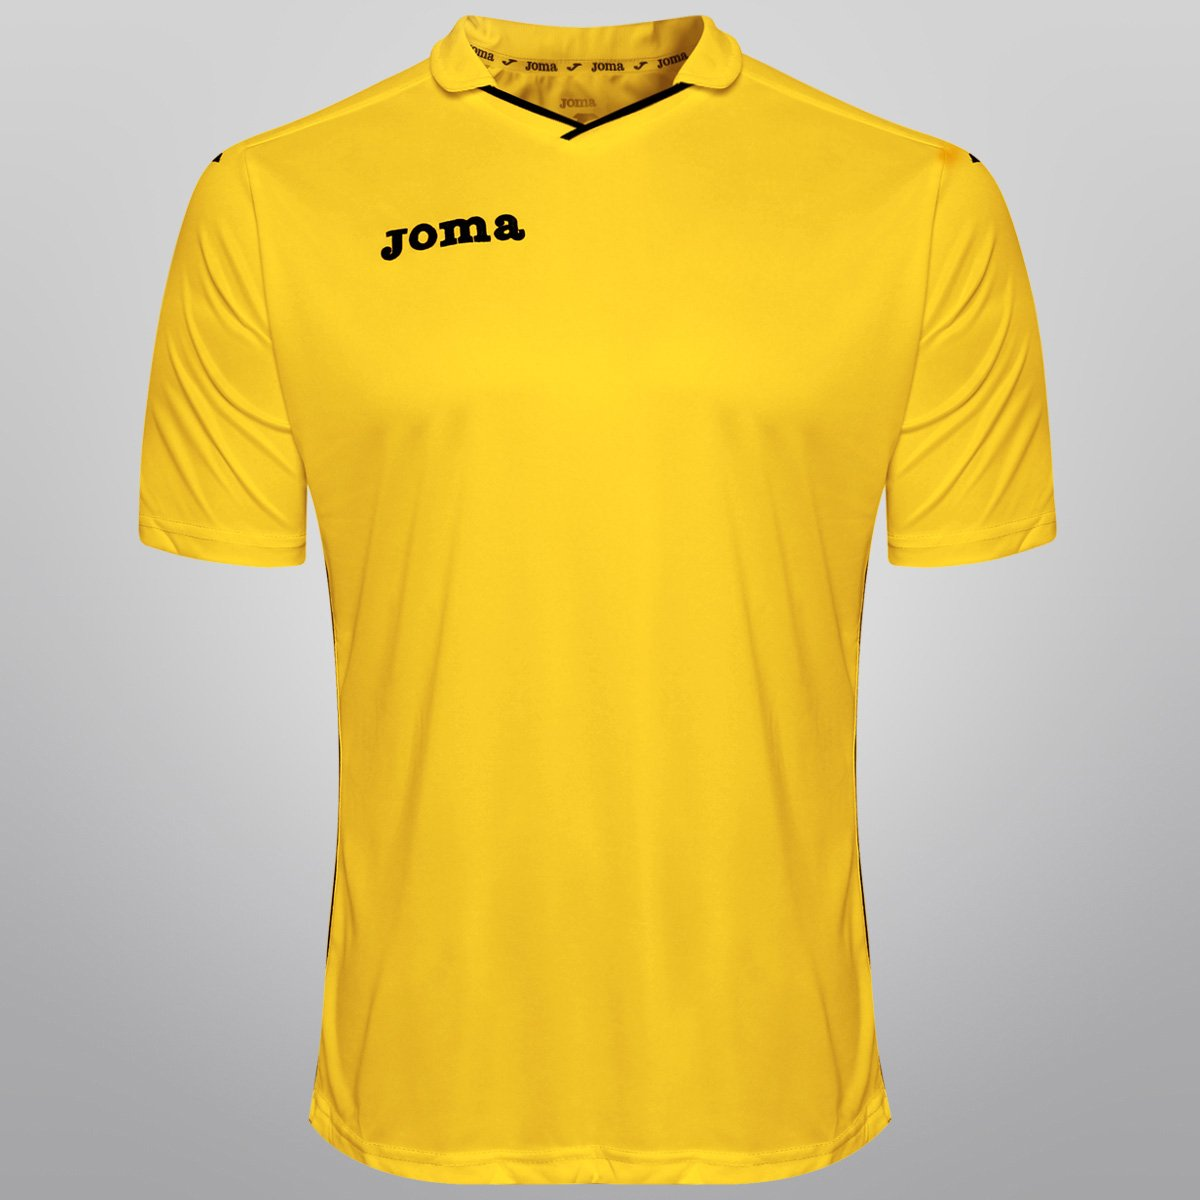 625952a228 Camiseta Joma Fit Rival - Compre Agora